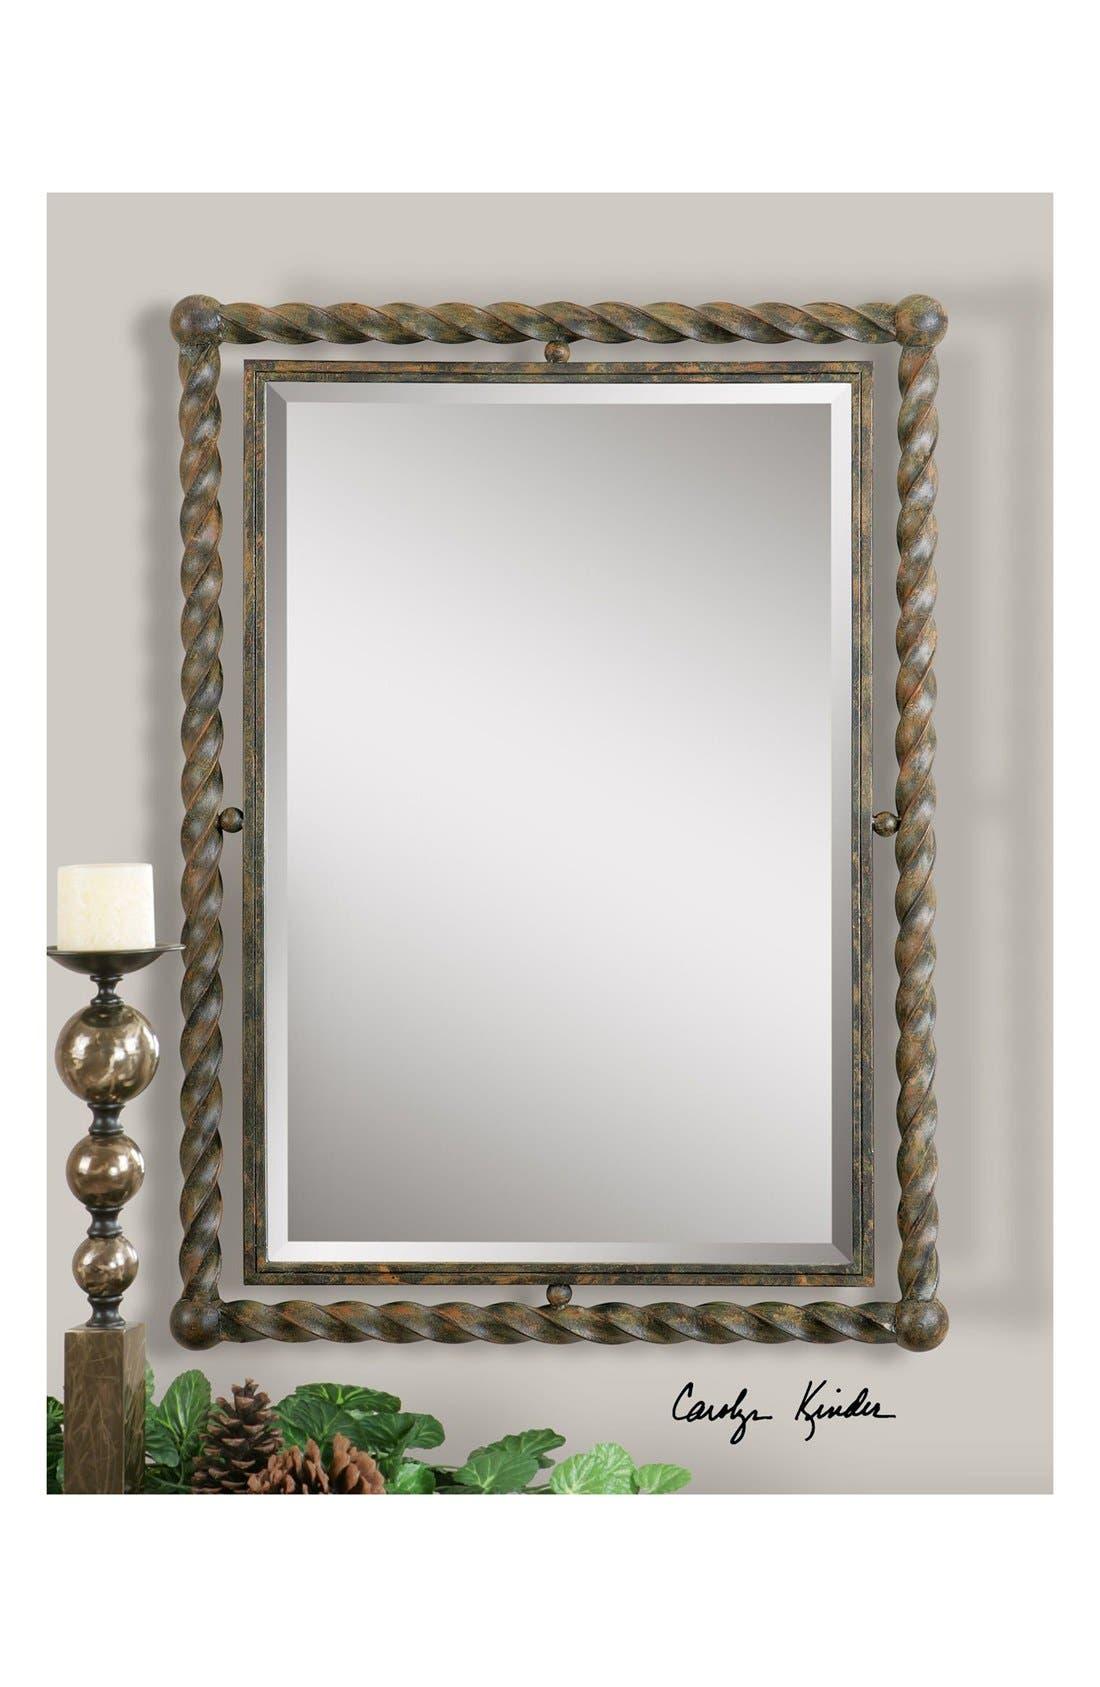 'Garrick' Wrought Iron Mirror,                             Alternate thumbnail 5, color,                             200